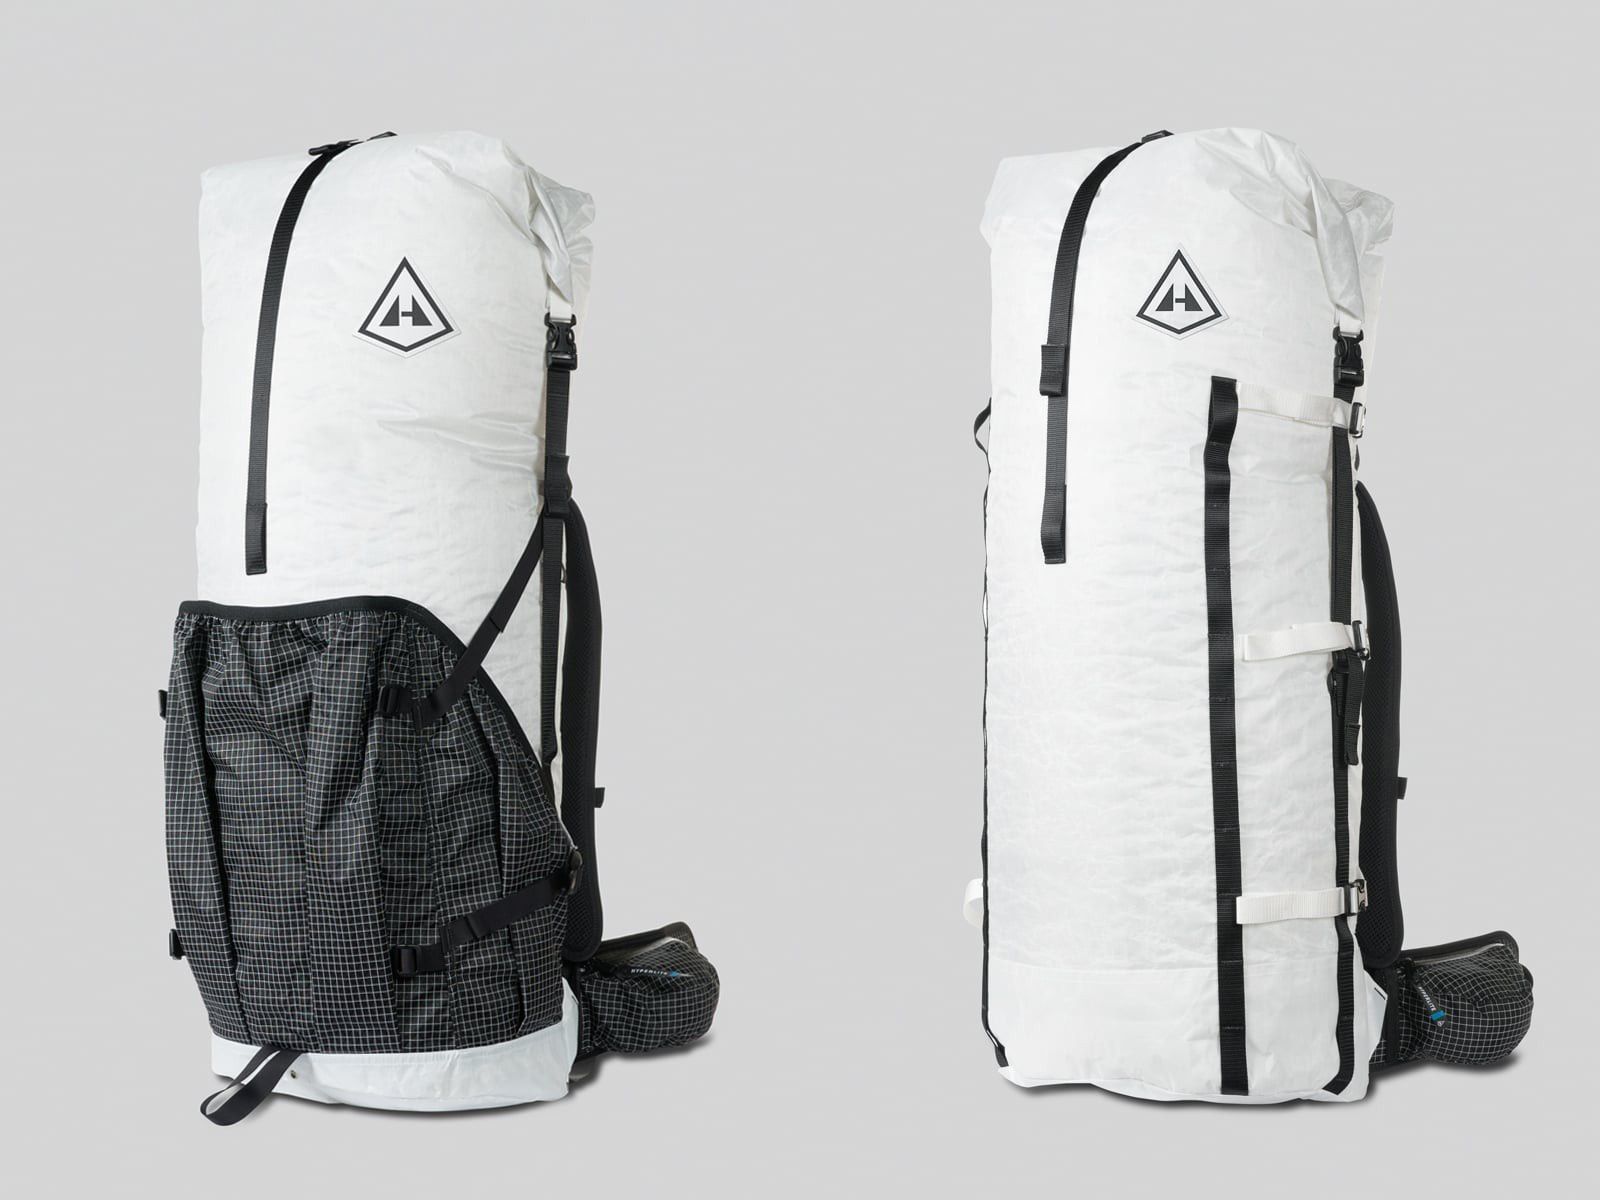 Hyperlite Mountain Gear Ultralight Backpack Review  Windrider ... 5d249baf71